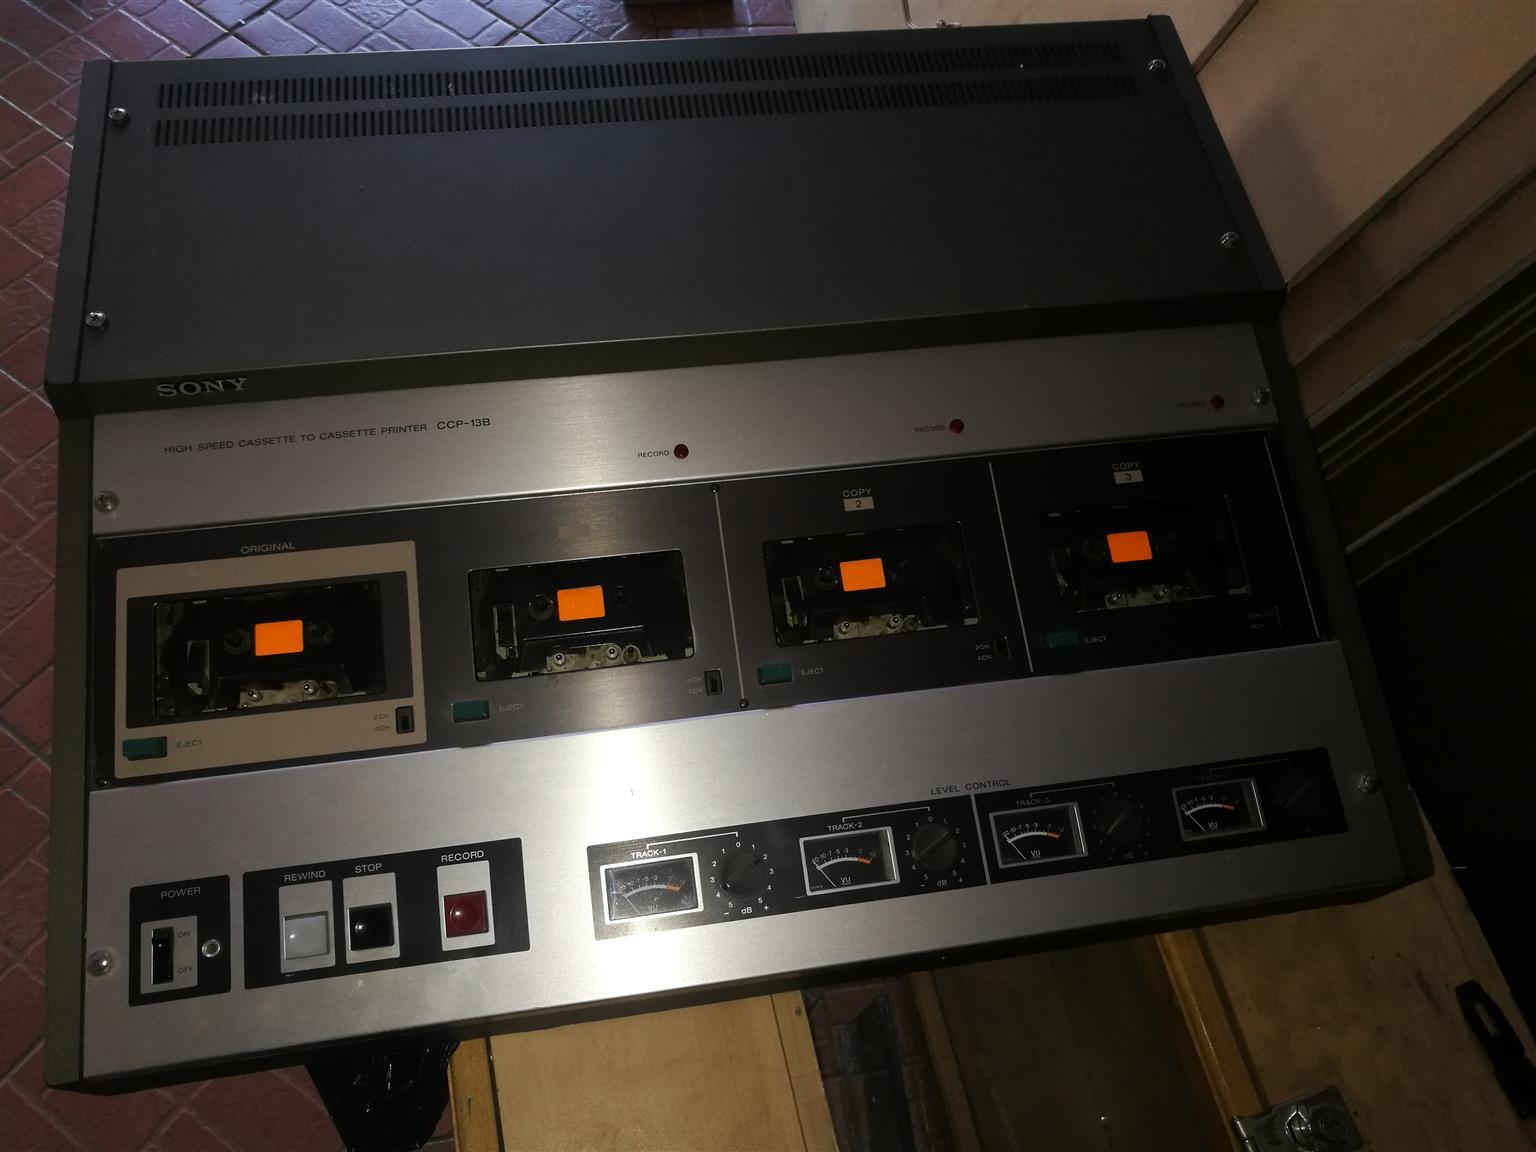 Sony Cassette to Cassette printer CCP-13B